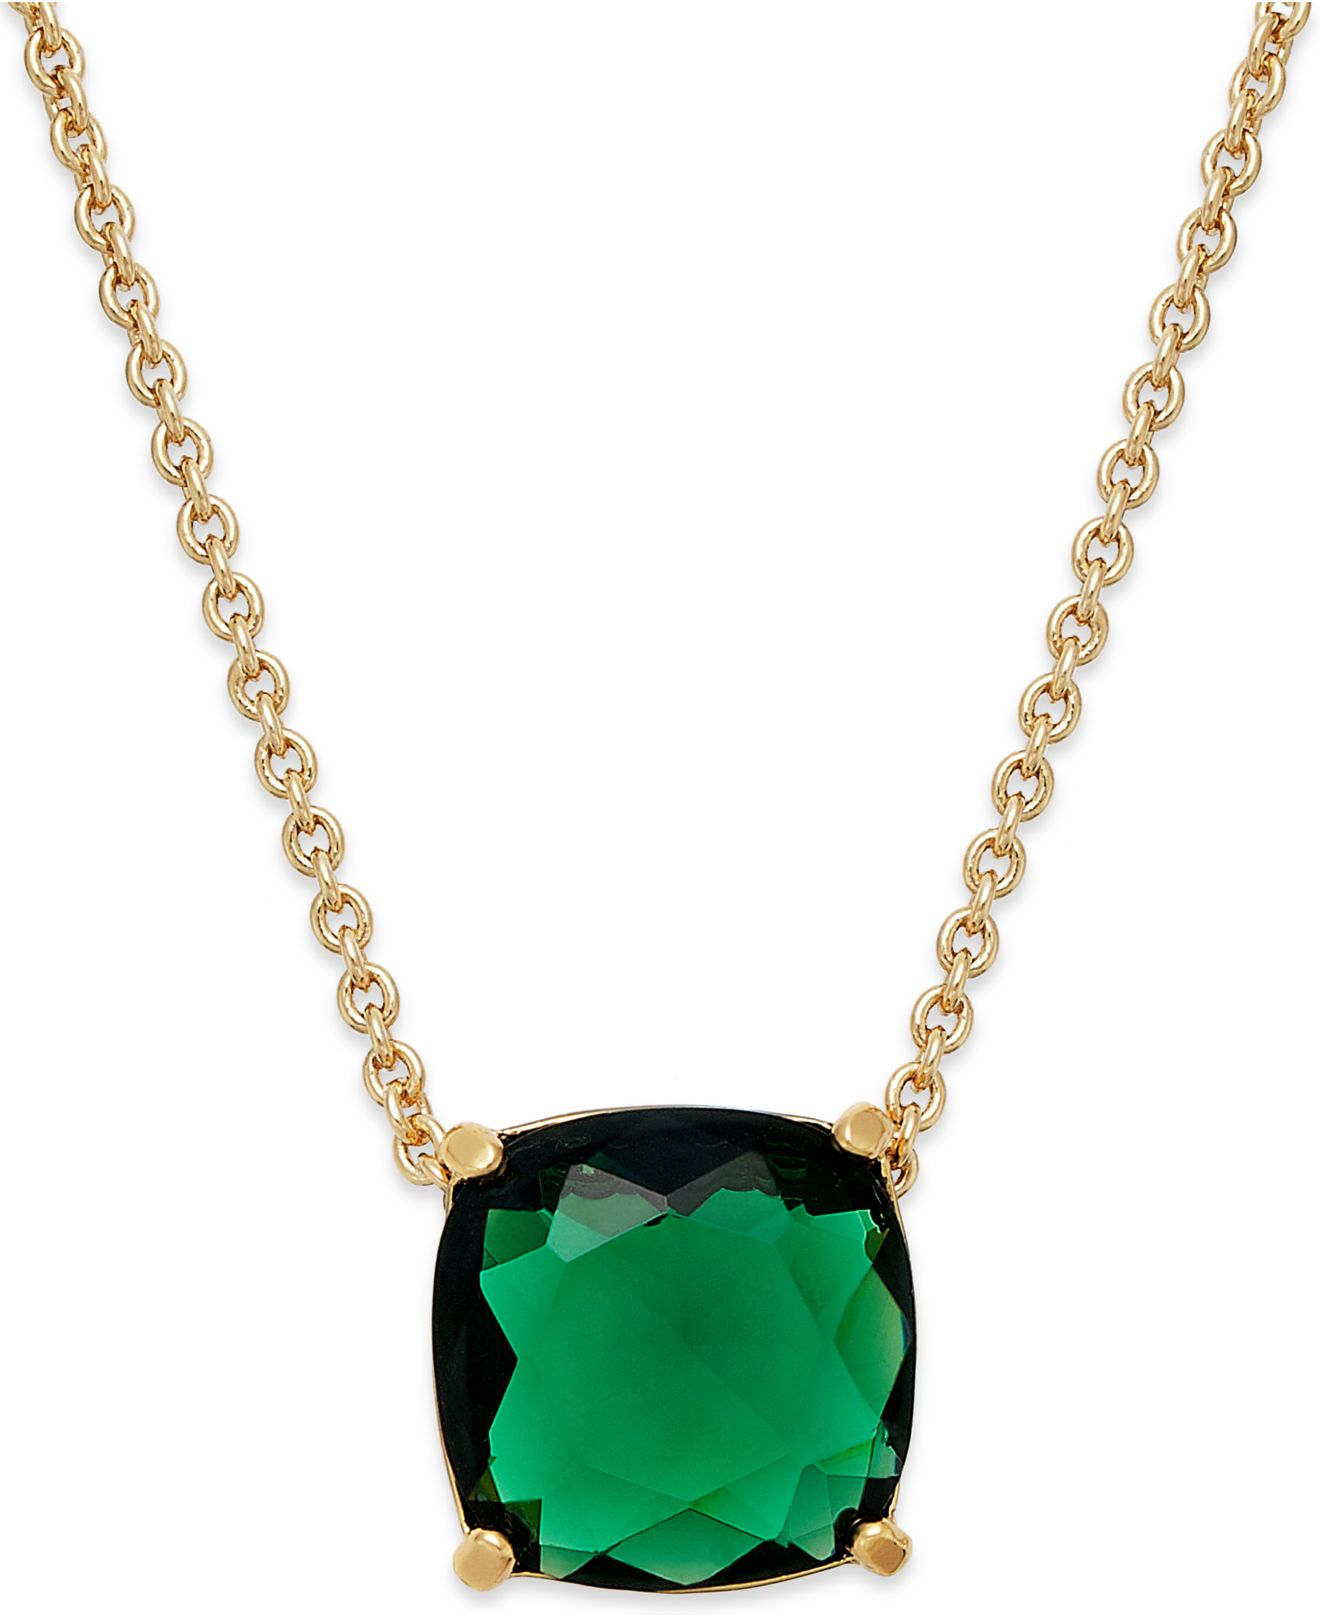 kate spade new york gold tone mini stone pendant necklace. Black Bedroom Furniture Sets. Home Design Ideas